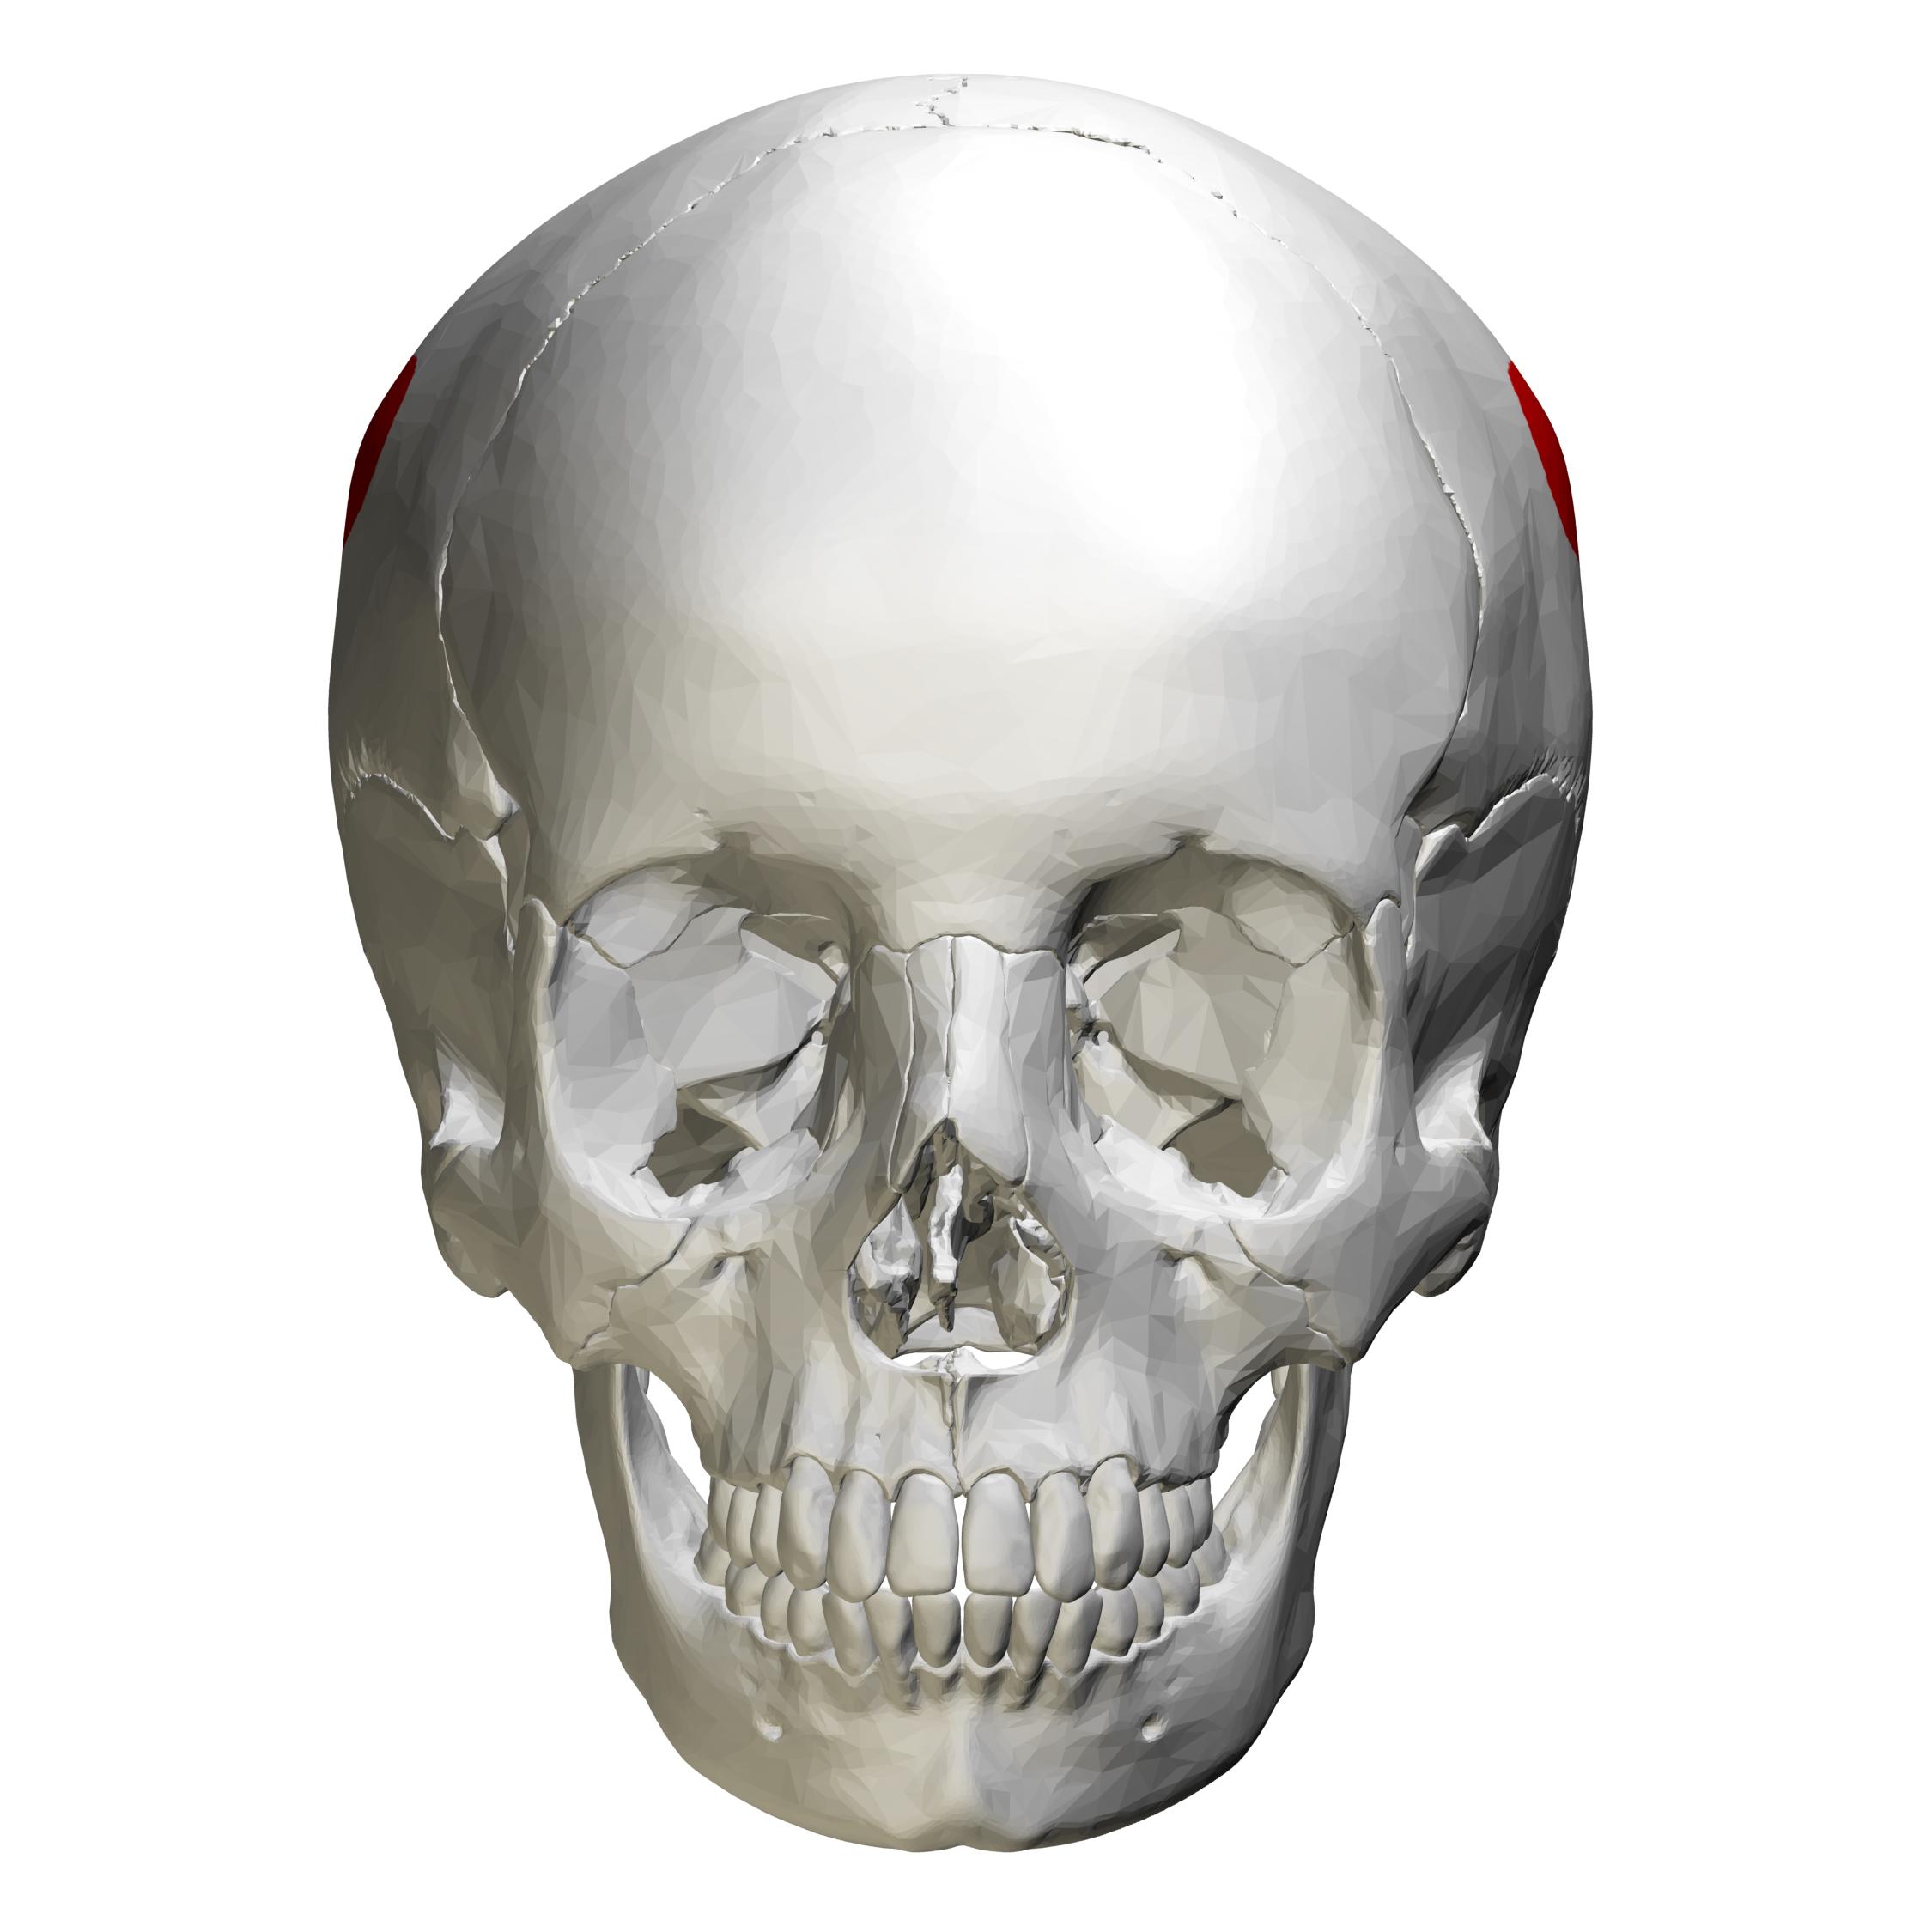 Fileparietal Eminence Skull Anterior View01g Wikimedia Commons